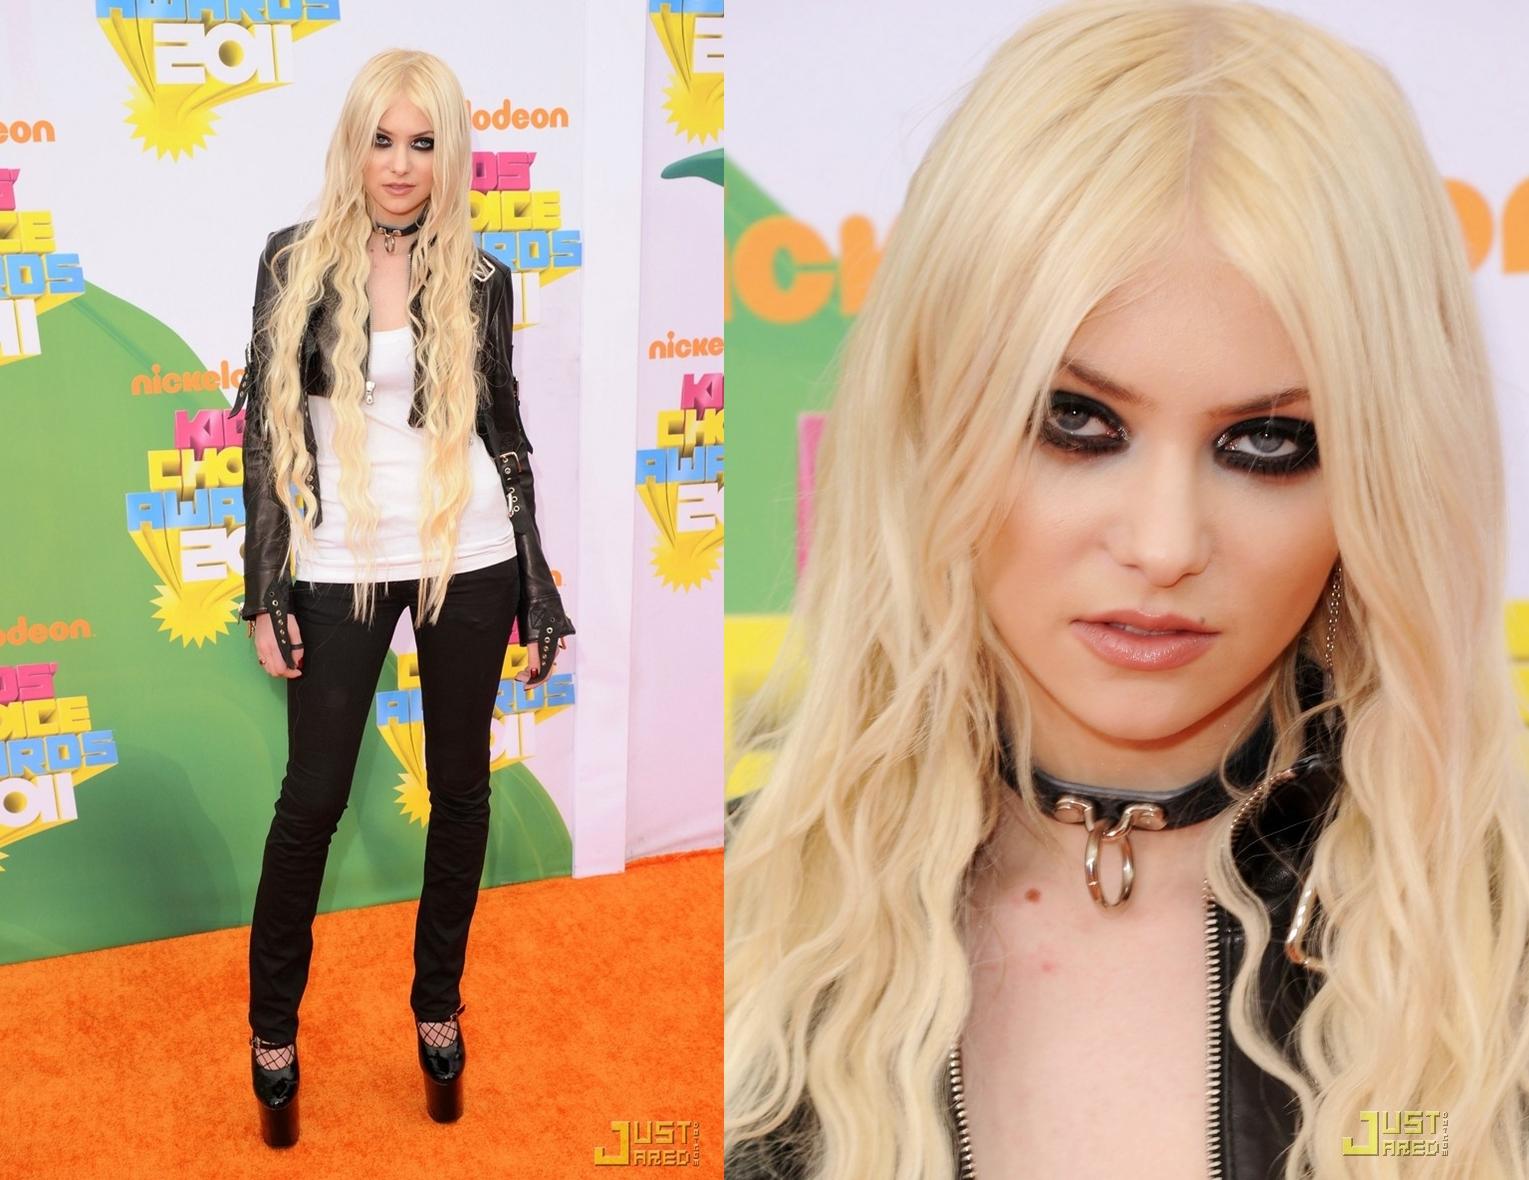 http://1.bp.blogspot.com/-gFnjrHGJ7OA/TbOu2zqGXcI/AAAAAAAAAXU/q8SyZH98wQ8/s1600/Taylor+Momsen-horz.jpg